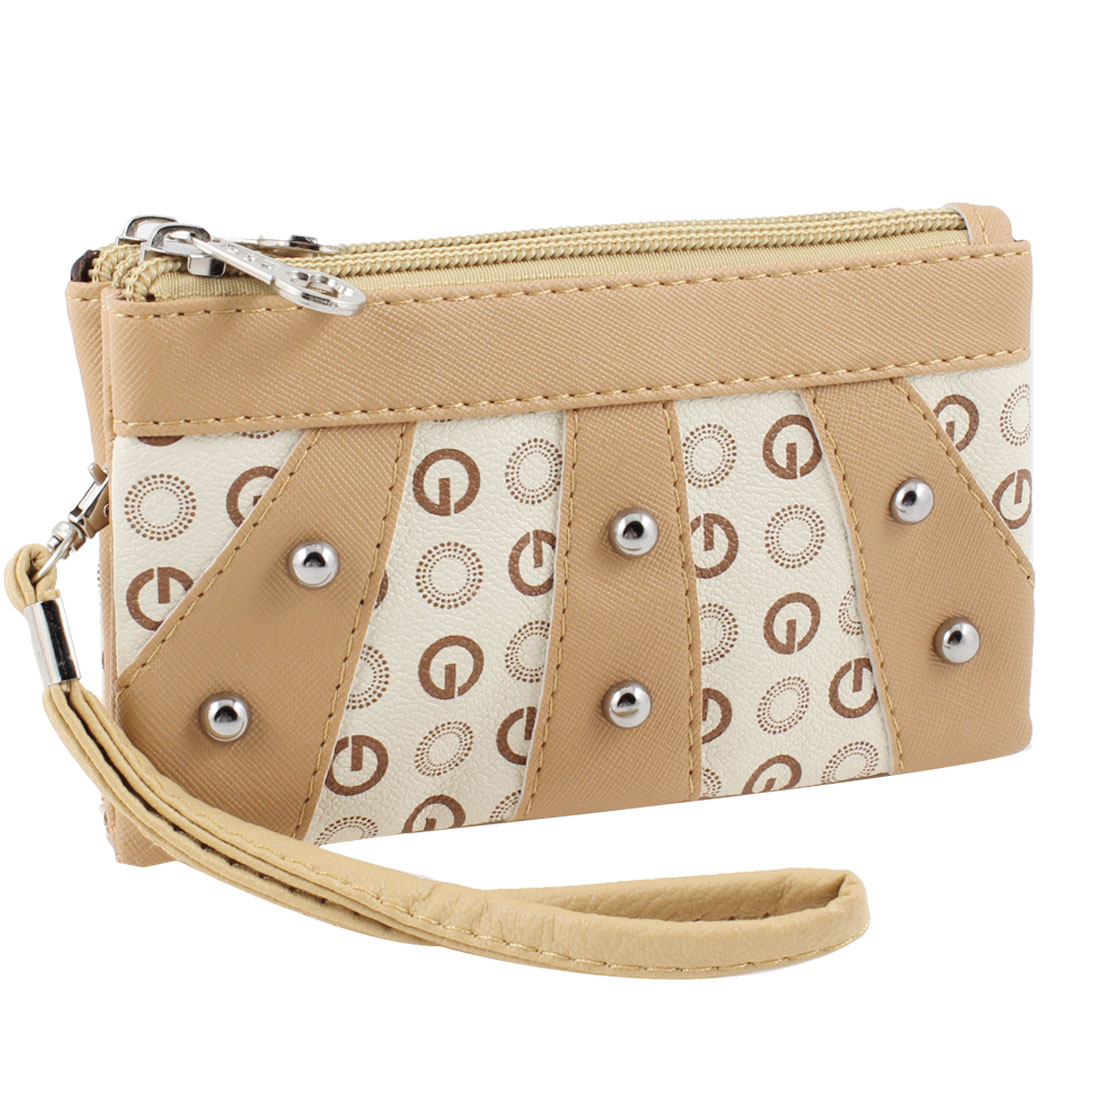 Lady Khaki Zip Closure 2 Compartments Wallet Hand Bag Change Purse w Strap